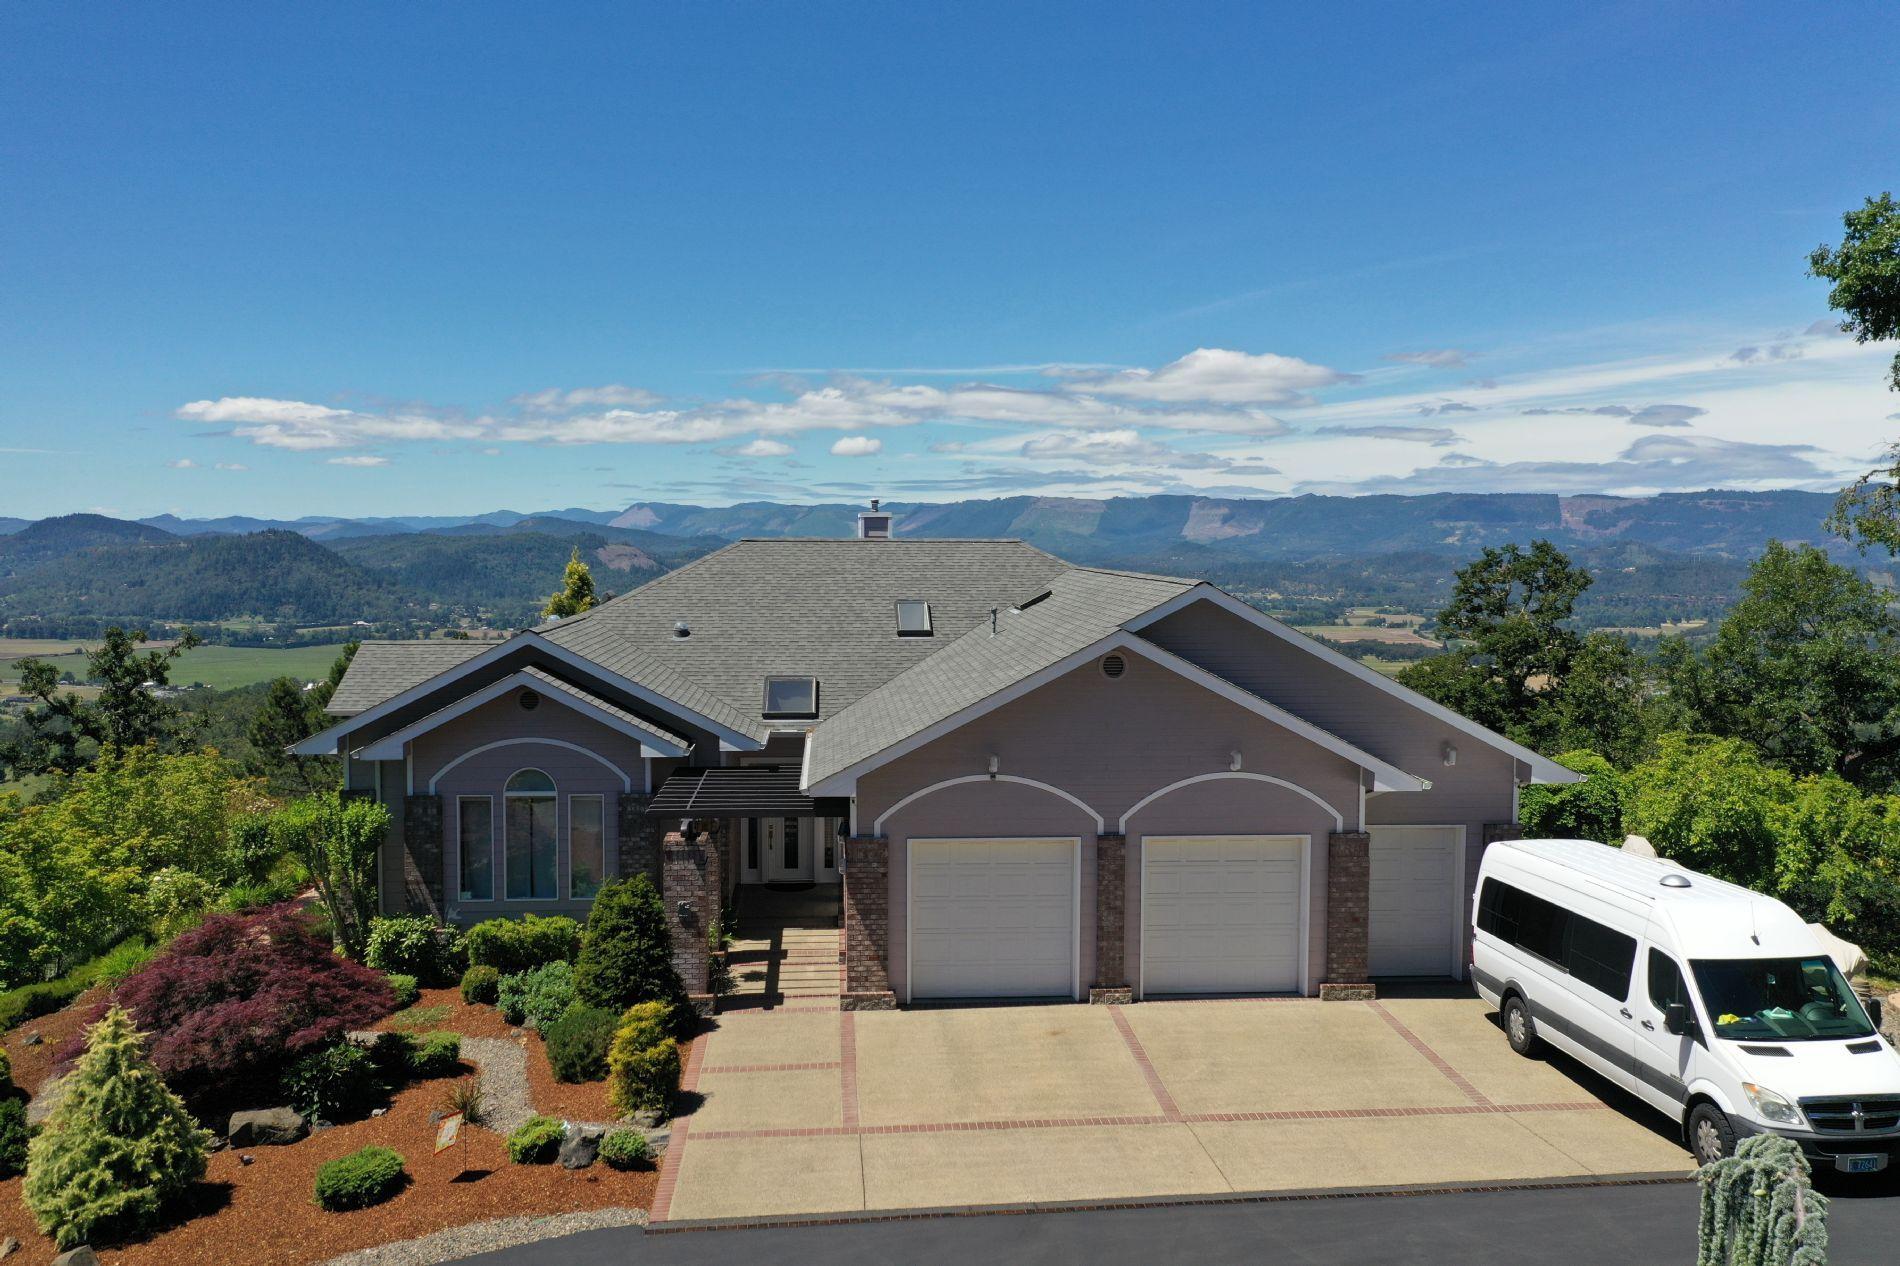 Tremendous Oregon For Sale By Owner Oregon Flat Fee Mls Oregon Interior Design Ideas Clesiryabchikinfo